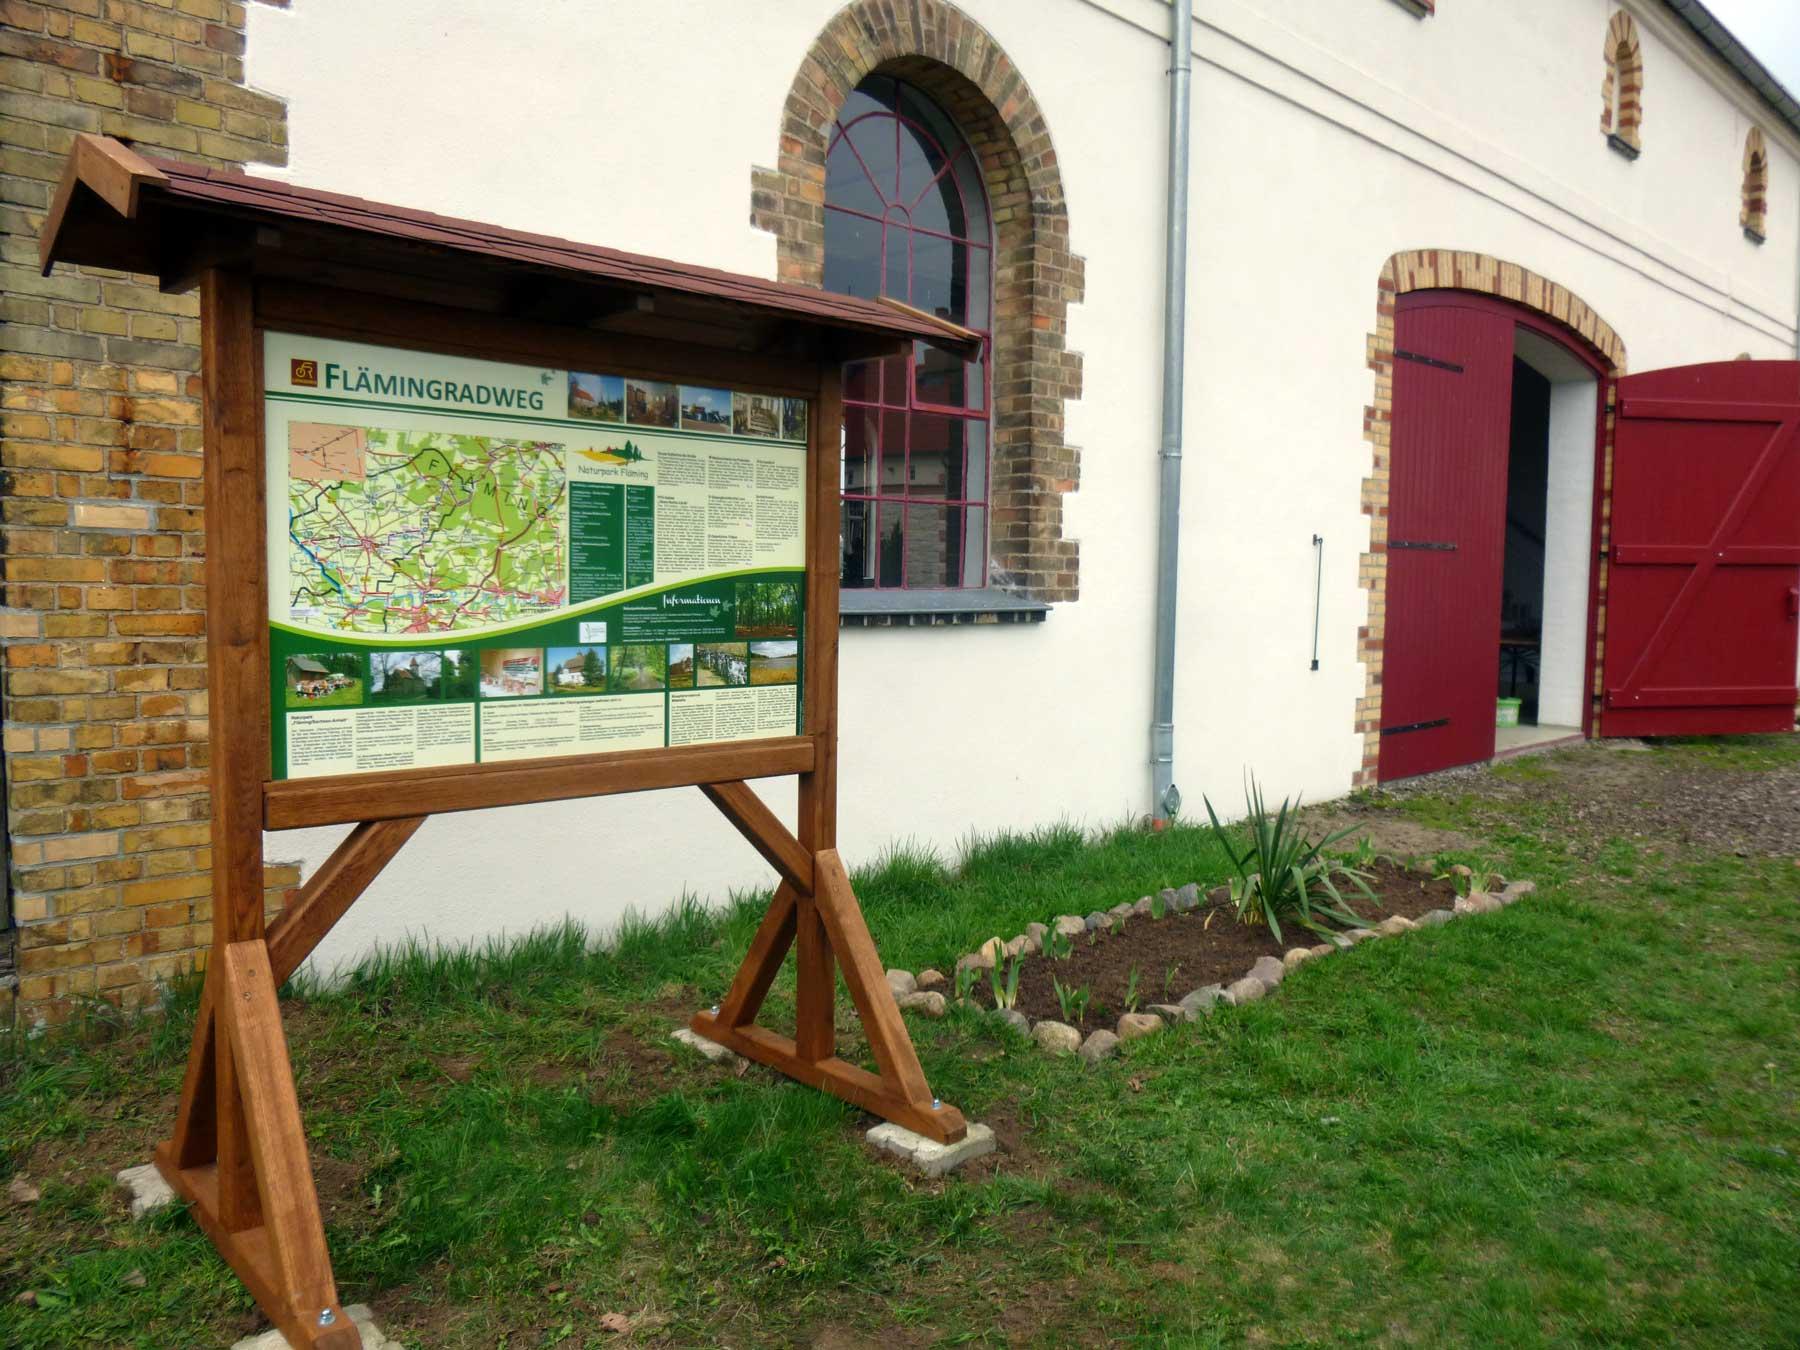 Dorfkirchenmuseum Flämingradweg Garitz